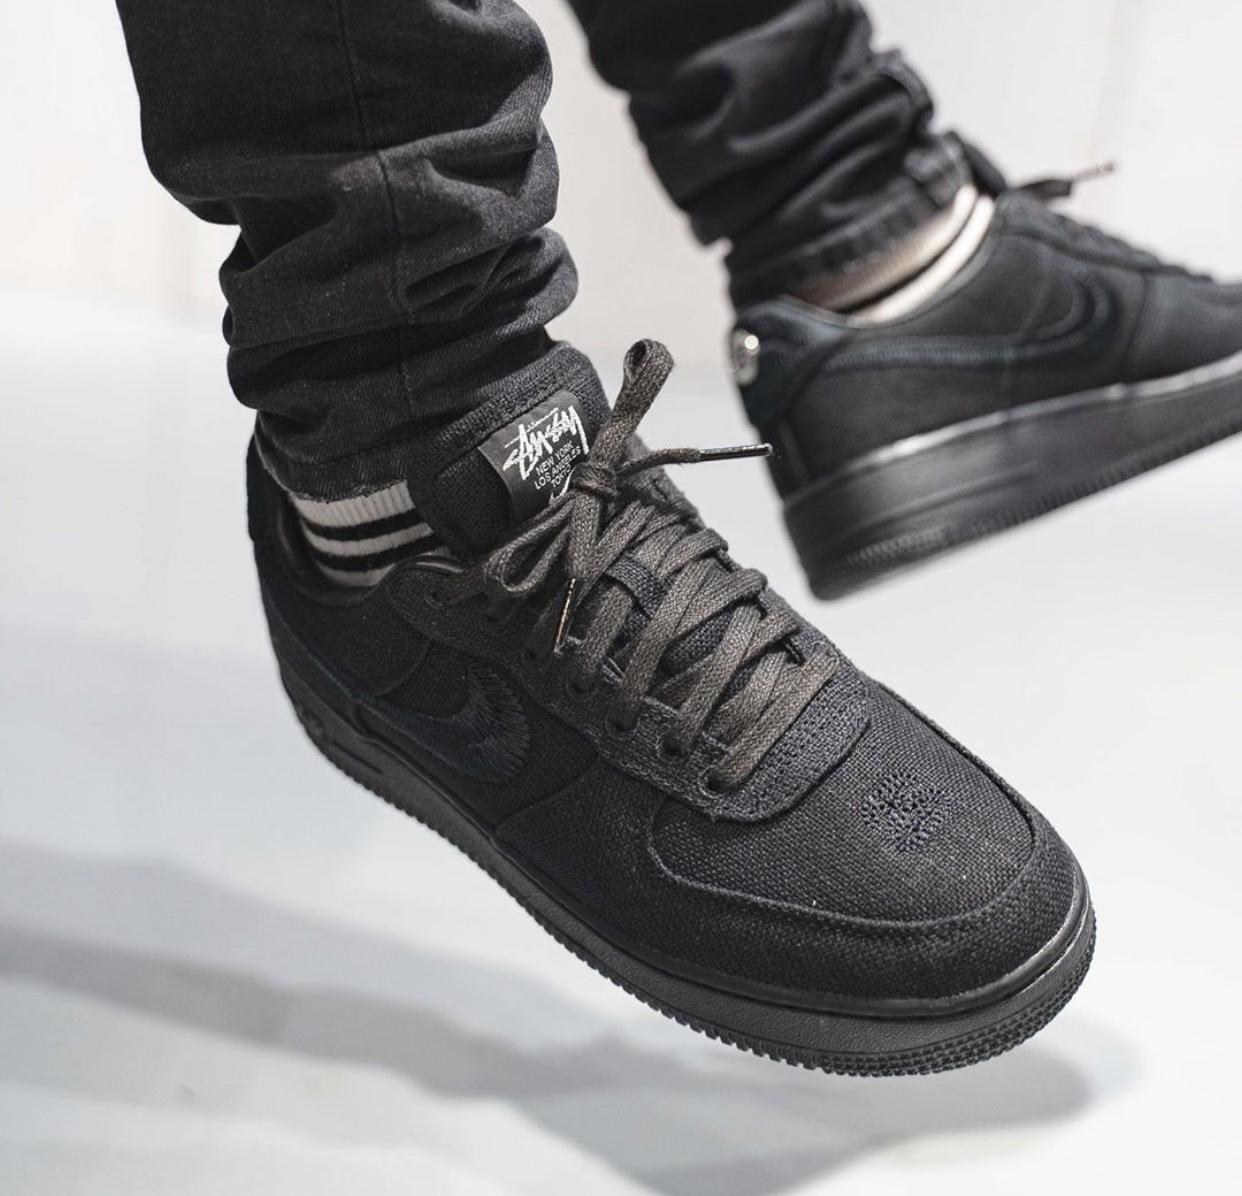 Stussy Nike Air Force 1 Low Black CZ9084-001 On Feet